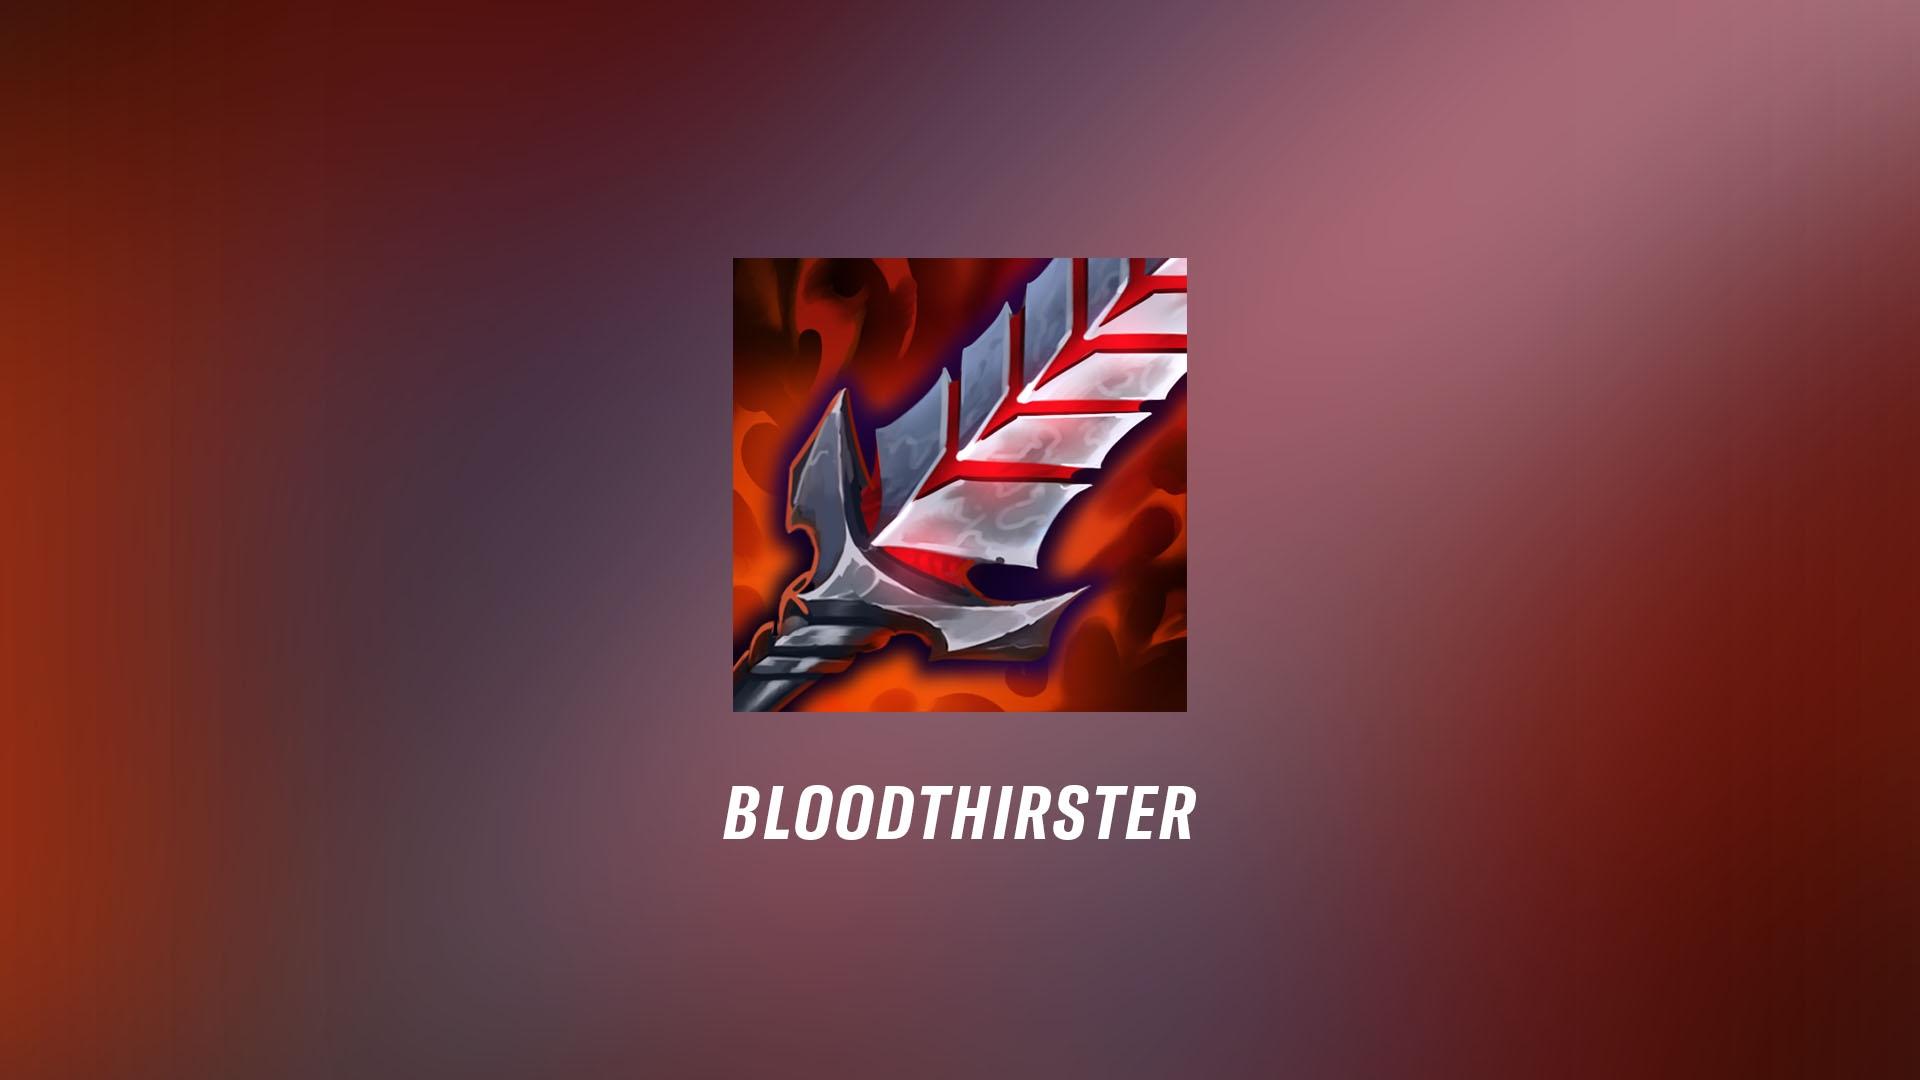 07272021_WRPatchNotes24_Bloodthirster.jpg